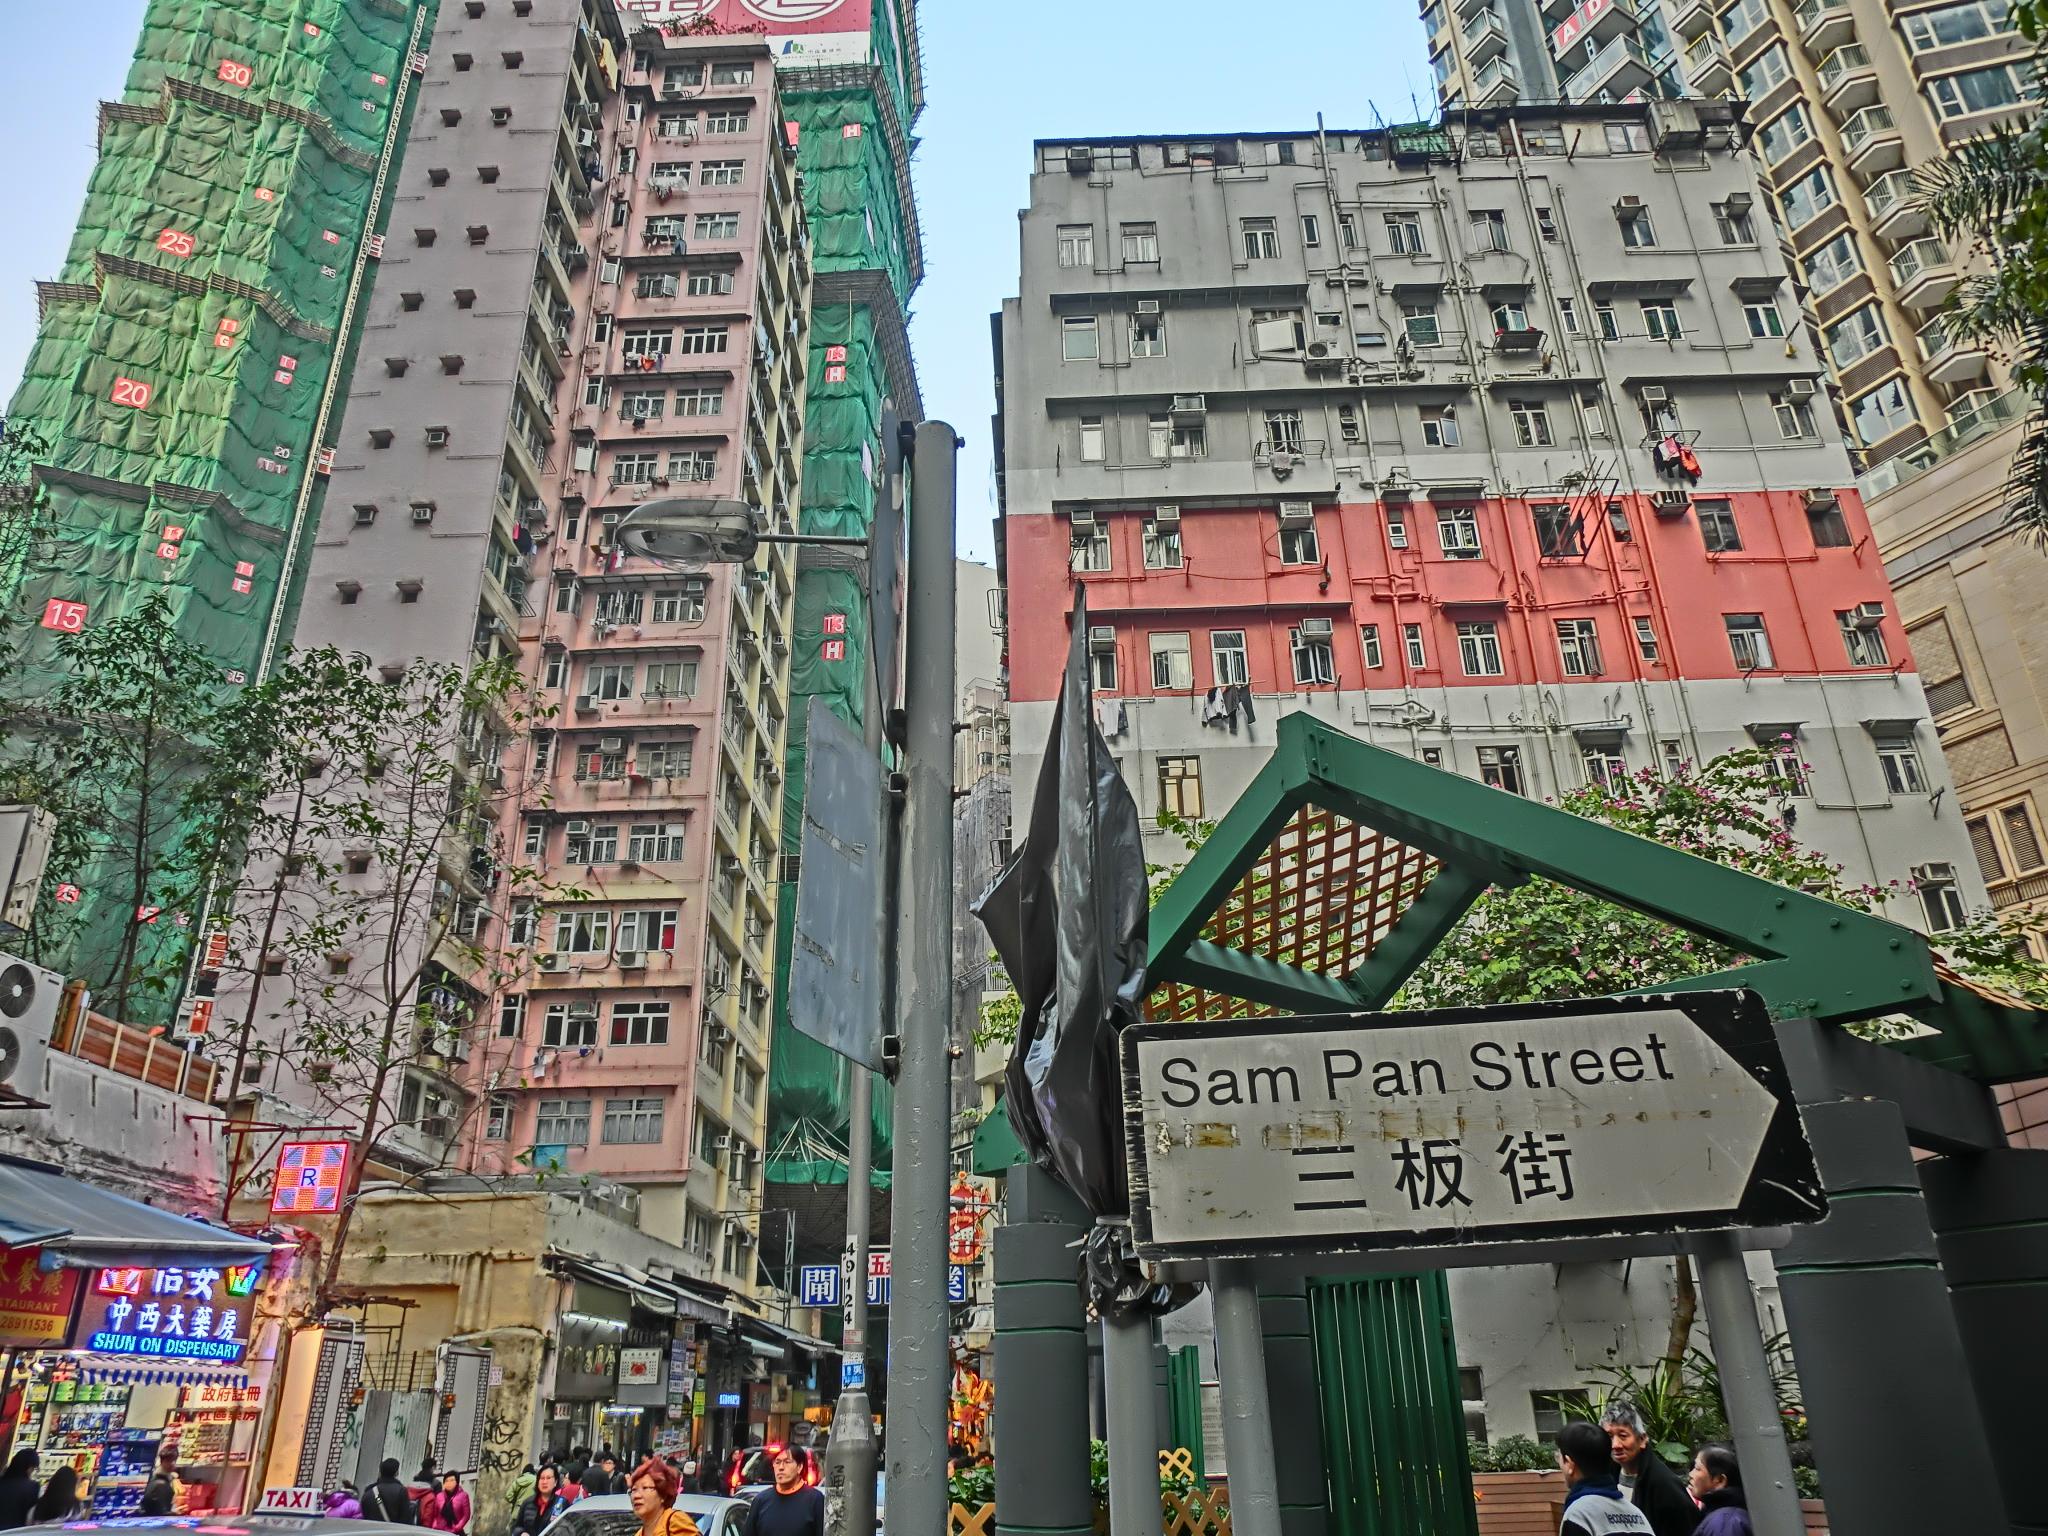 File:HK 灣仔 Wan Chai 春園街 Spring Garden Lane view 囍匯 The Avenue Dec-2013 Sam Pan Street name sign.JPG - Wikimedia Commons